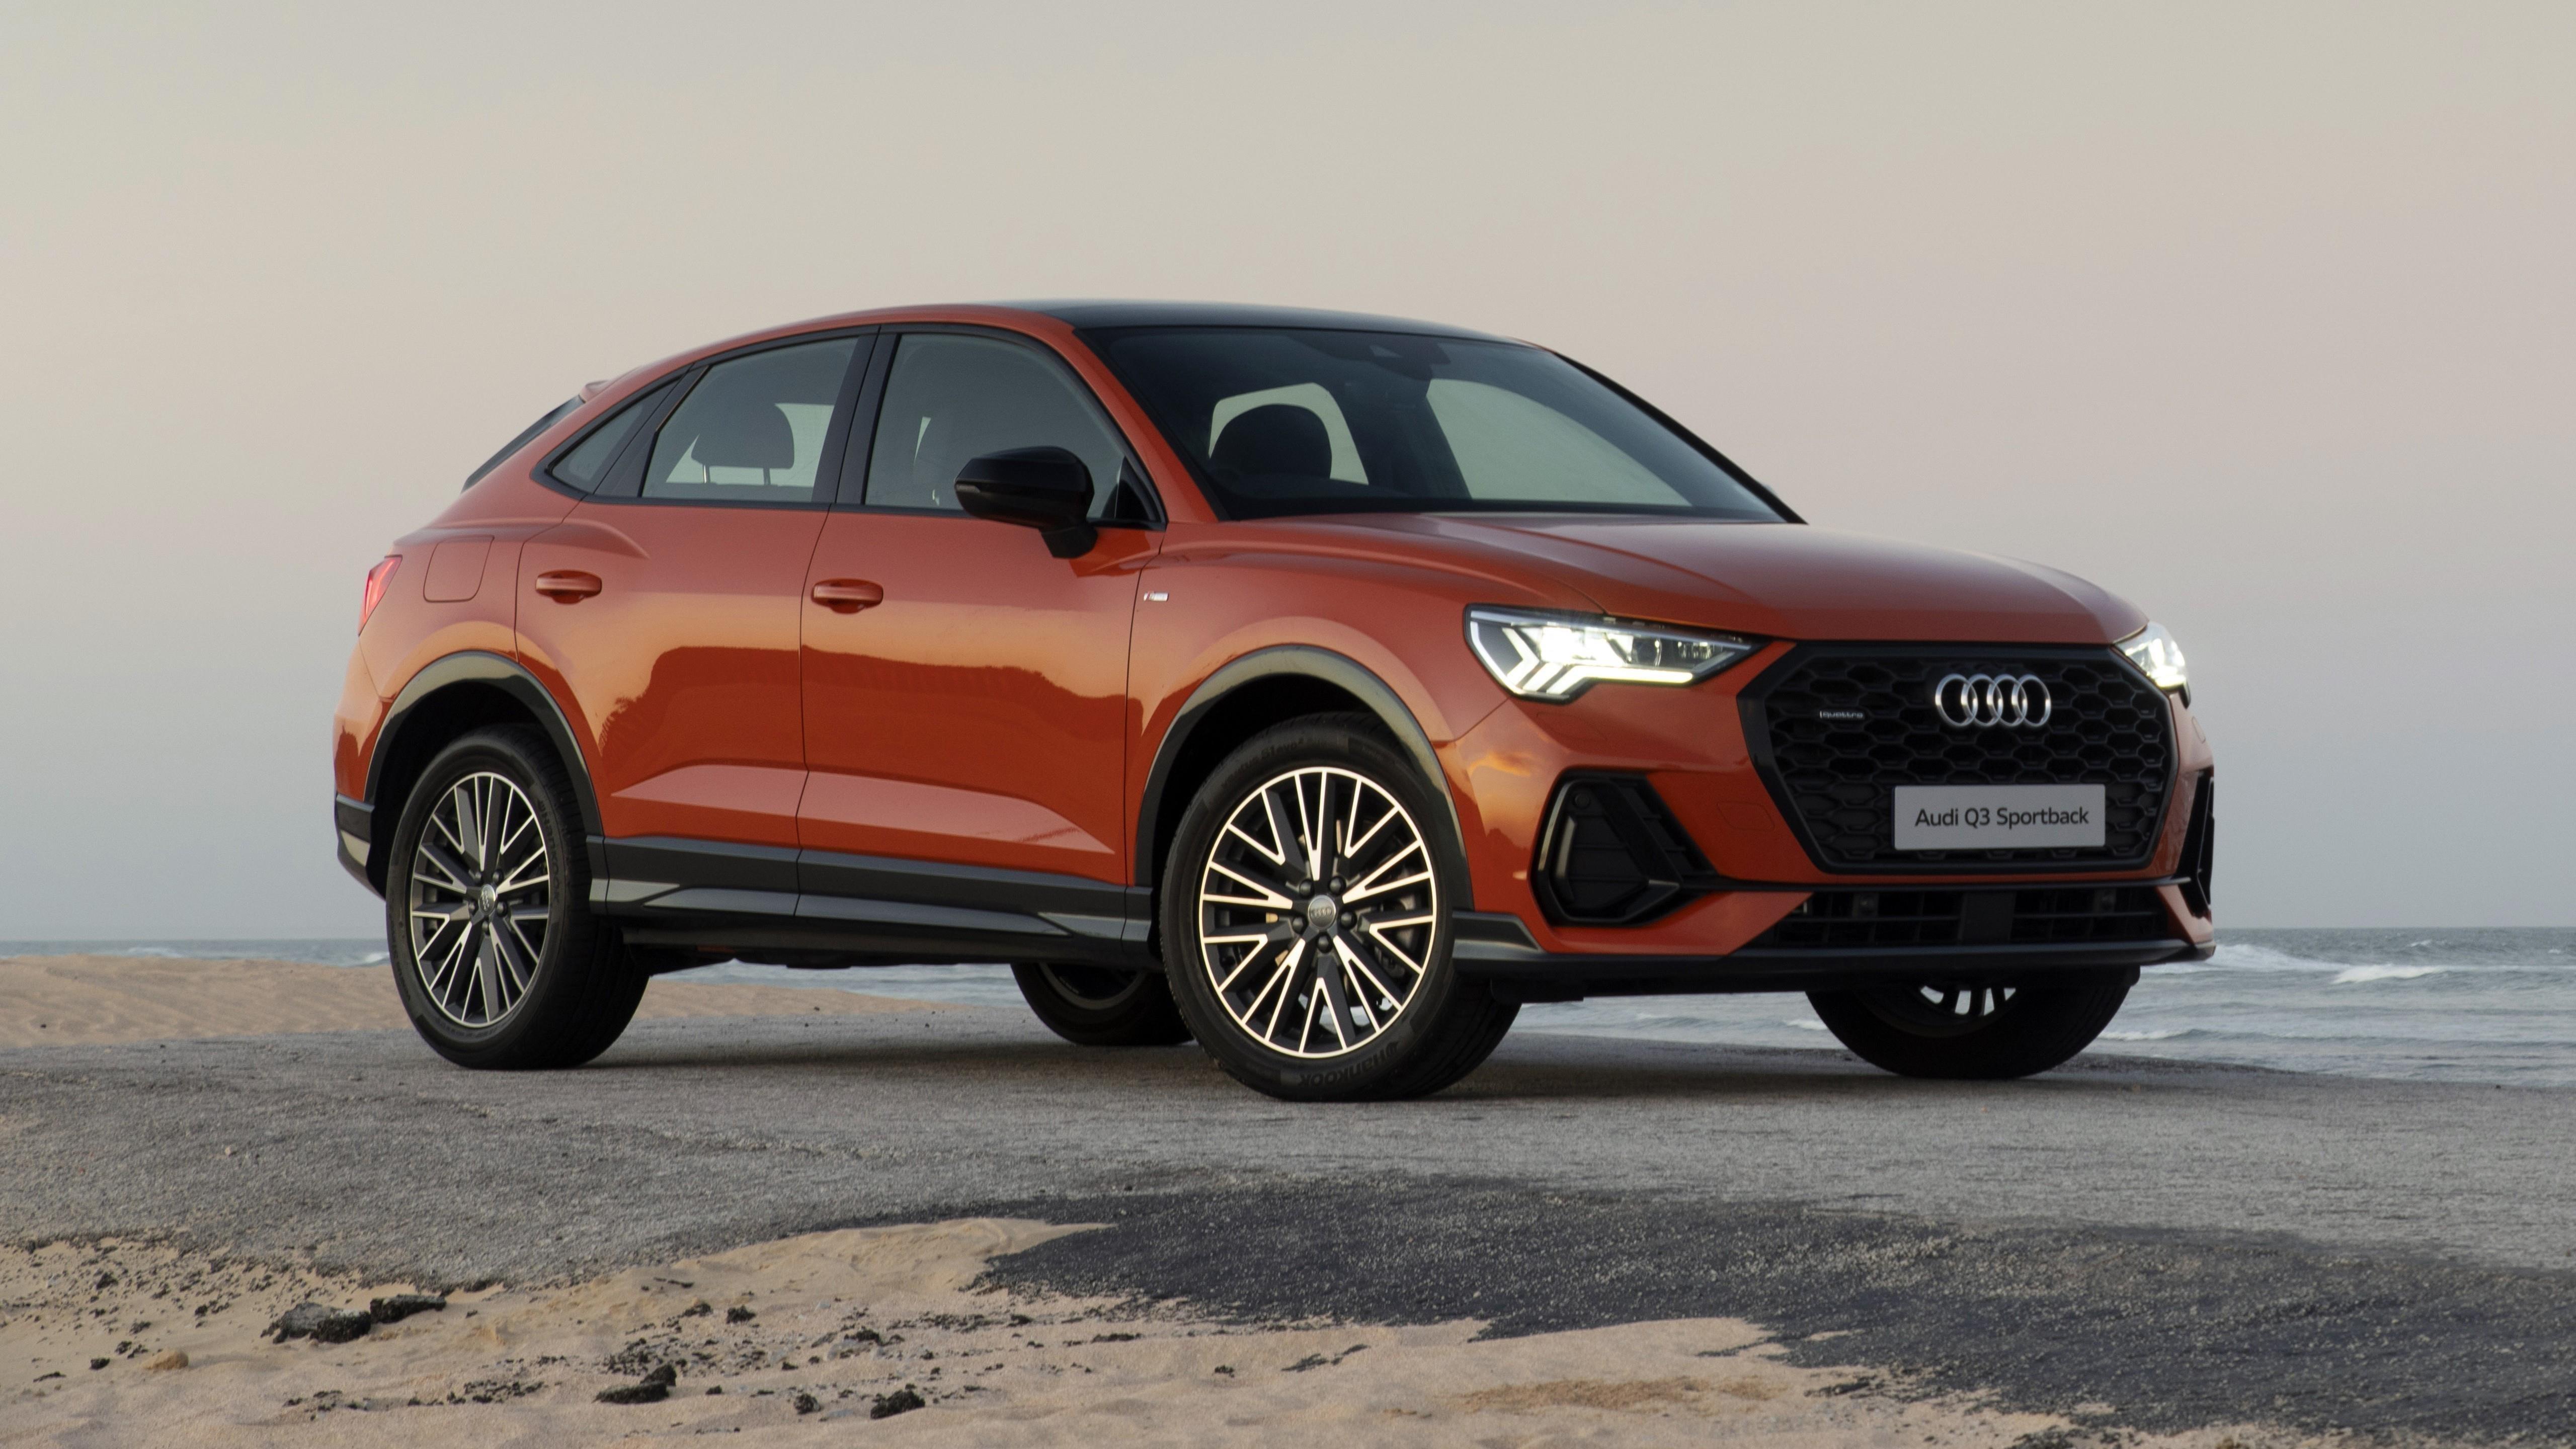 Audi q3 sportback 40 tfsi quattro s line 2020 автомобили обои скачать